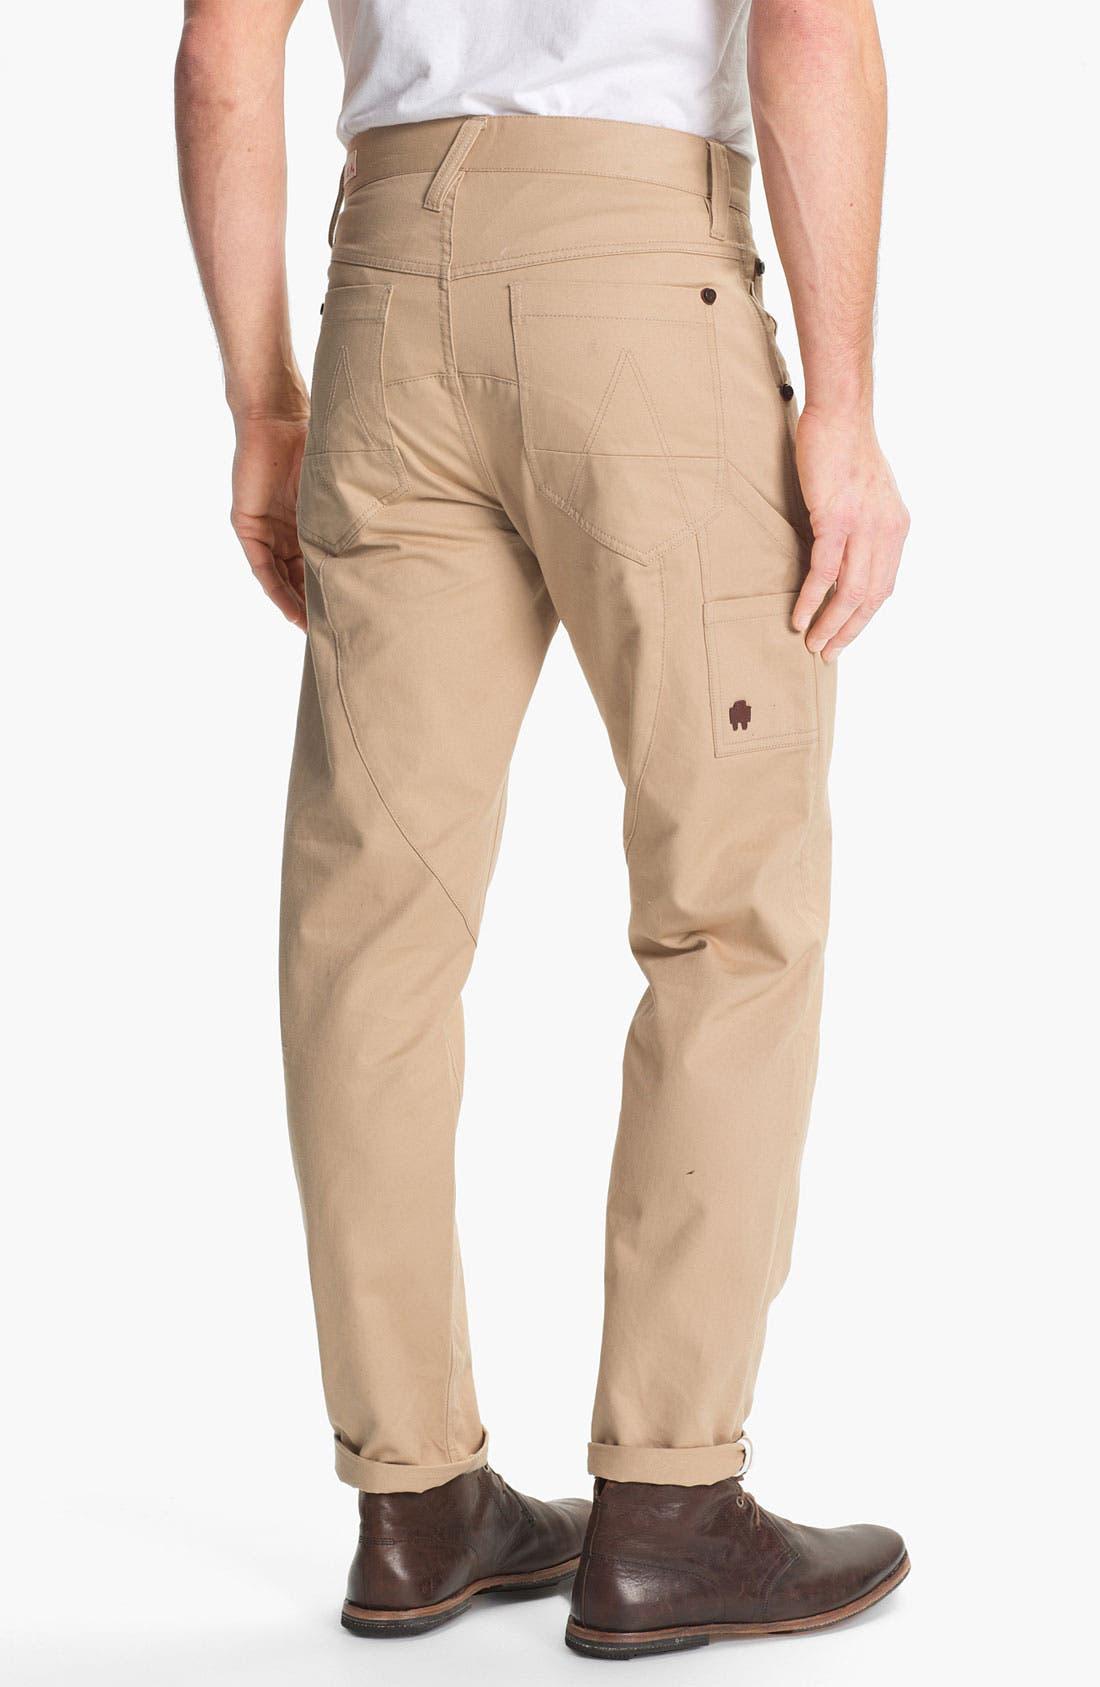 Alternate Image 1 Selected - Marshall Artist Cotton Twill Workshop Pants